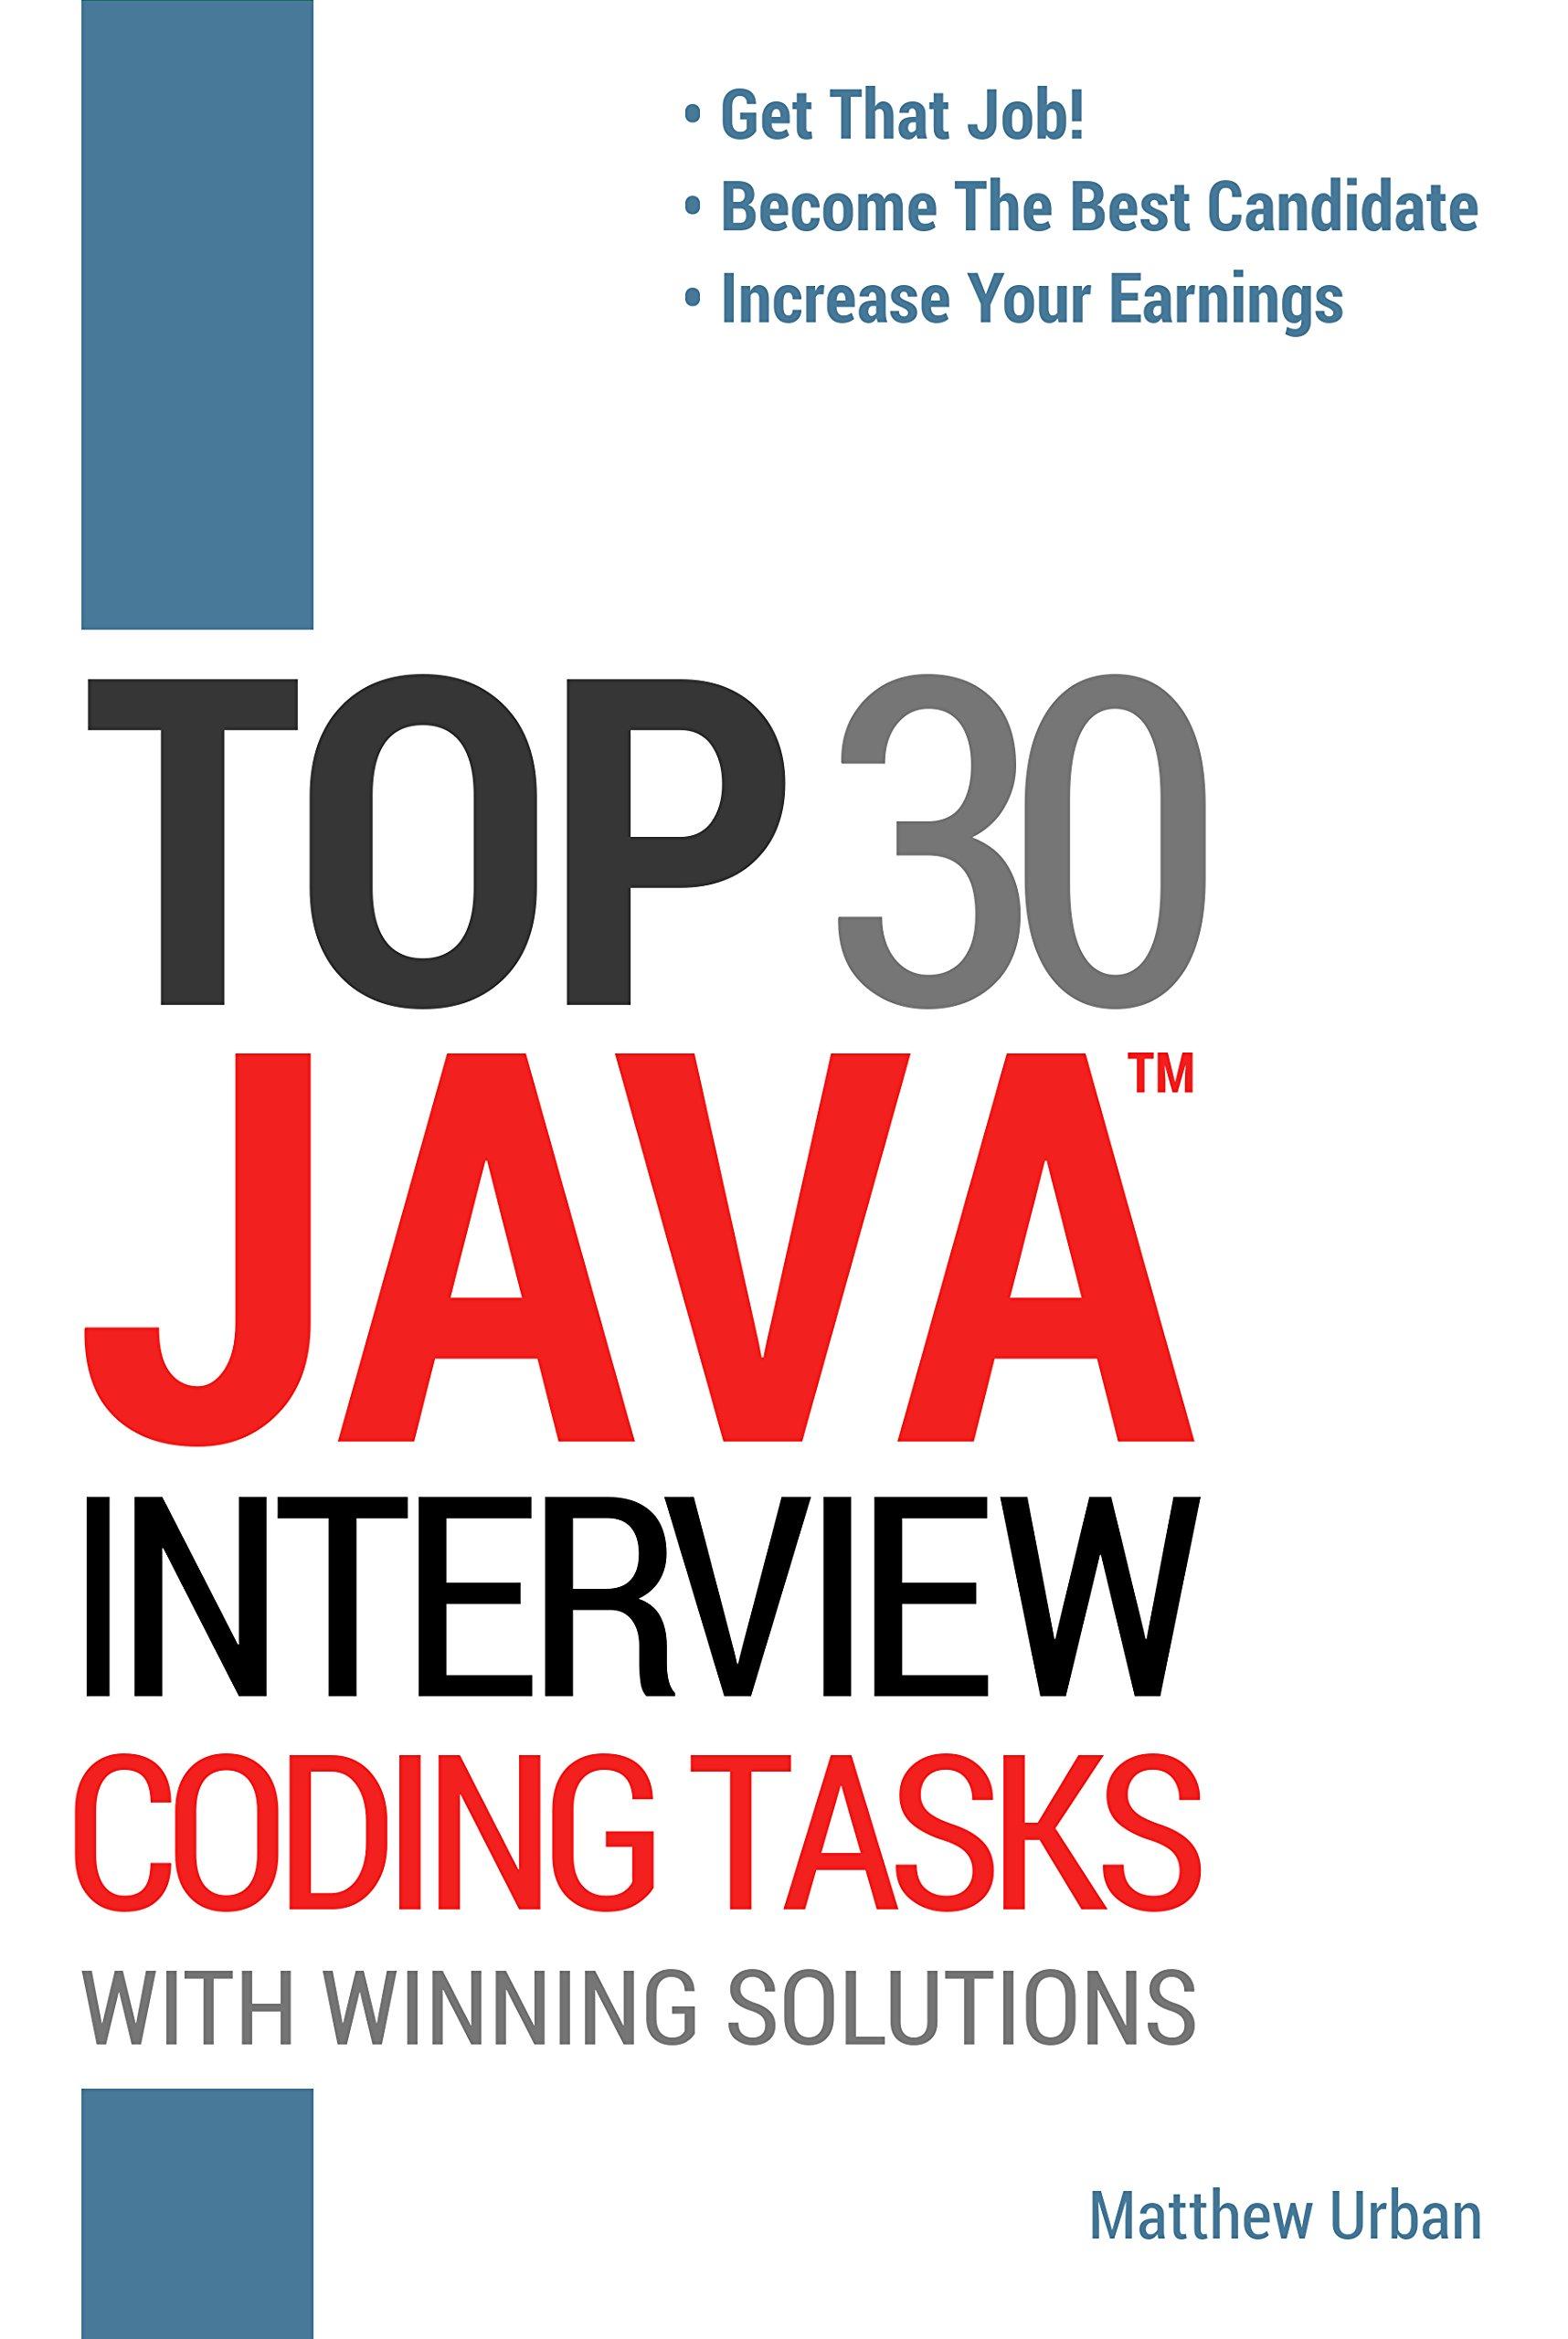 TOP 30 Java Interview Coding Tasks